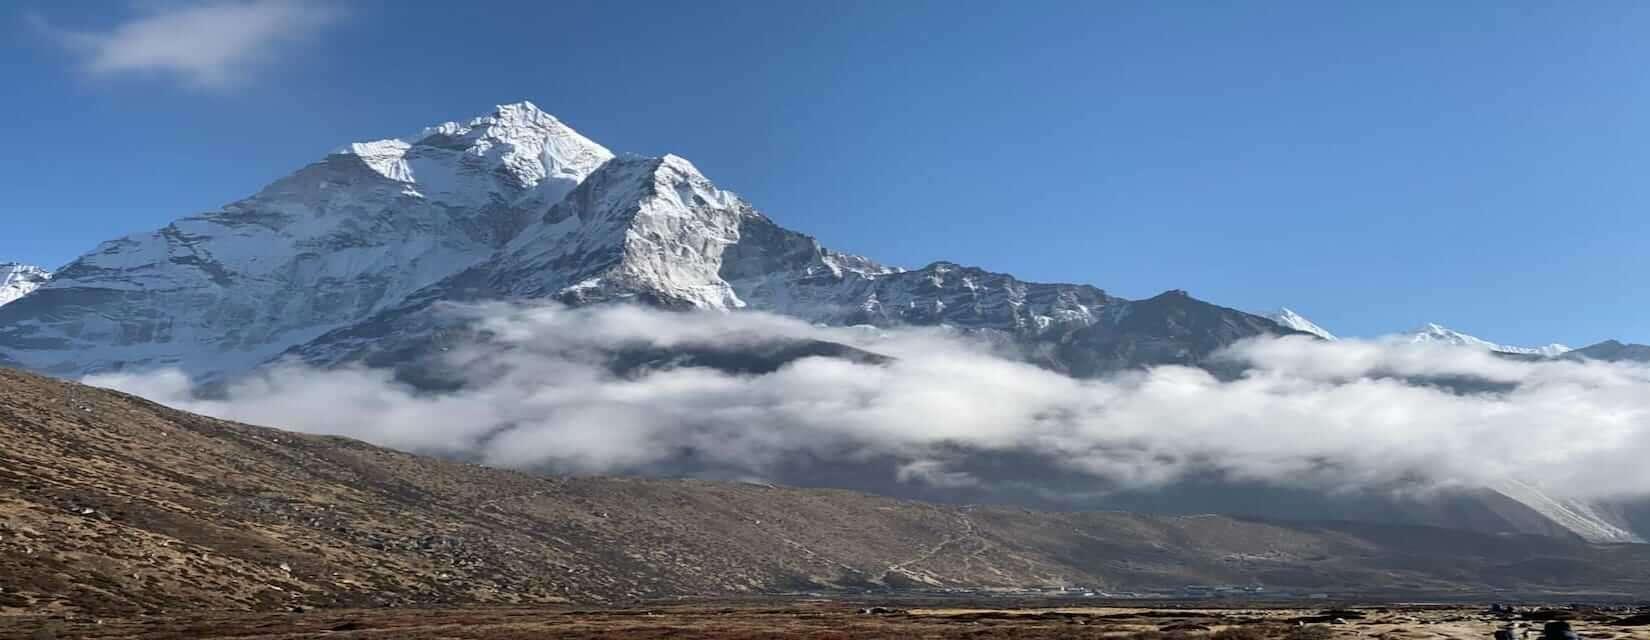 Acute Mountain Sickness (AMS) - Himalayan Frozen Adventure